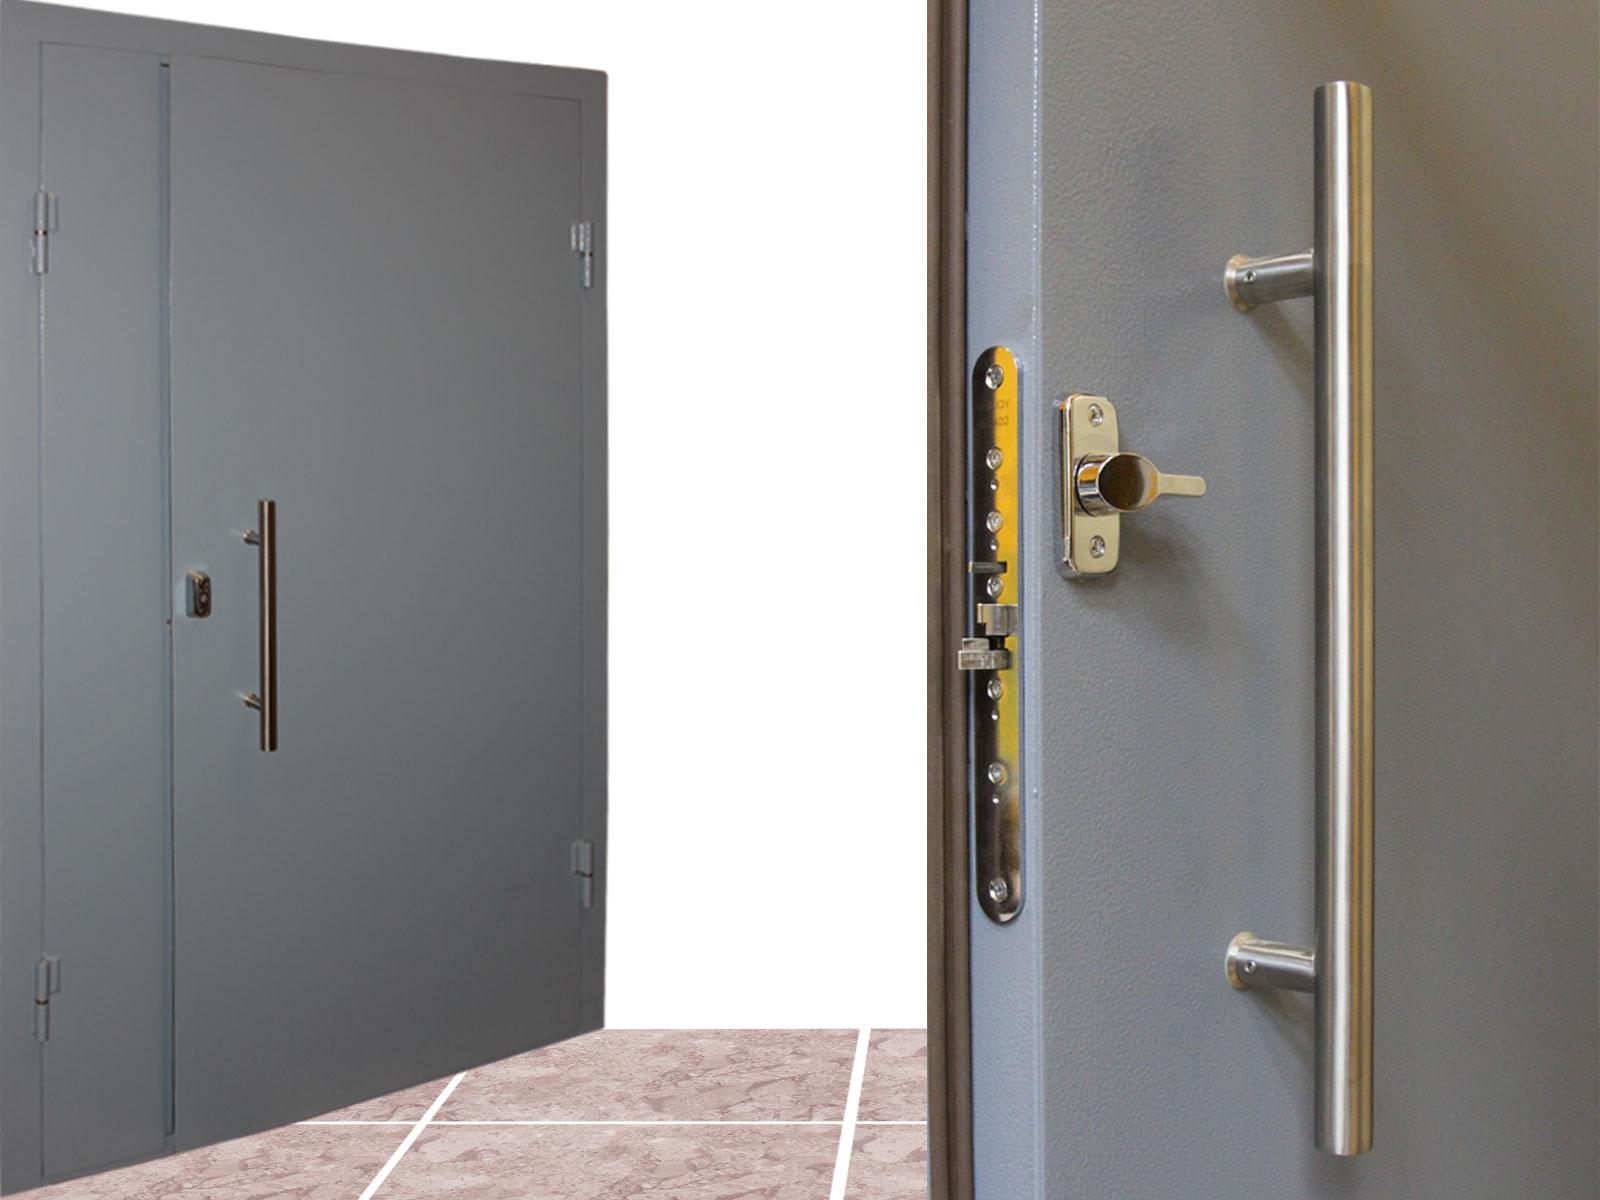 тамбурные железные дверь